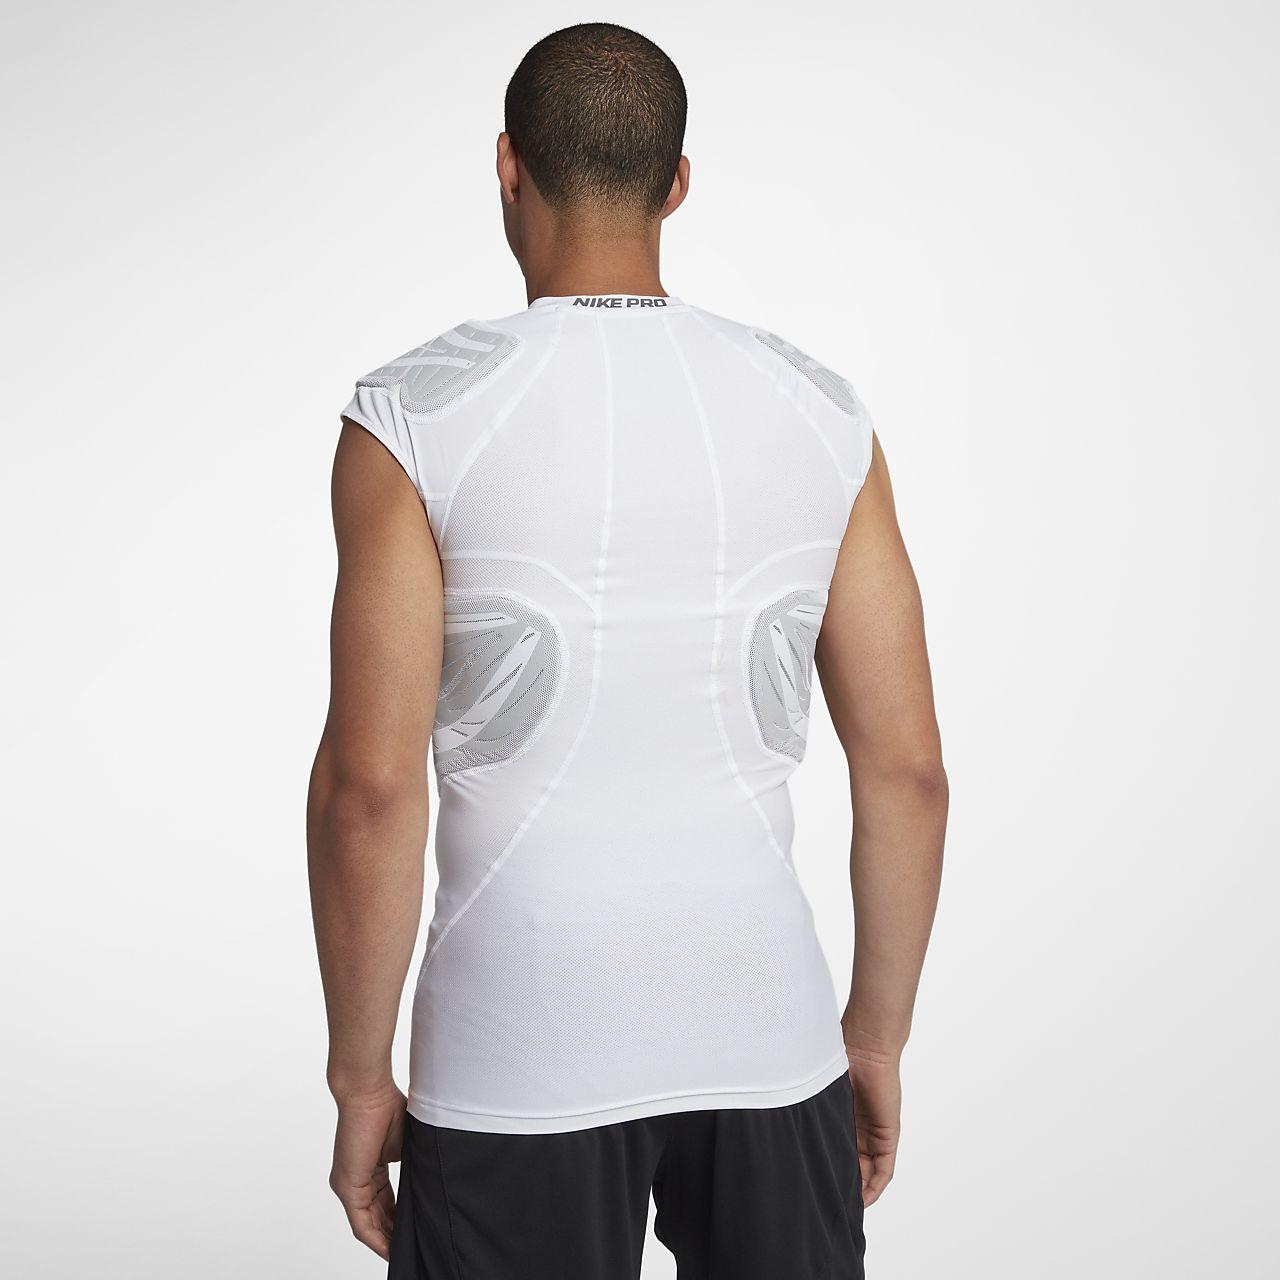 ... Nike Pro HyperStrong Men's Sleeveless Football Top